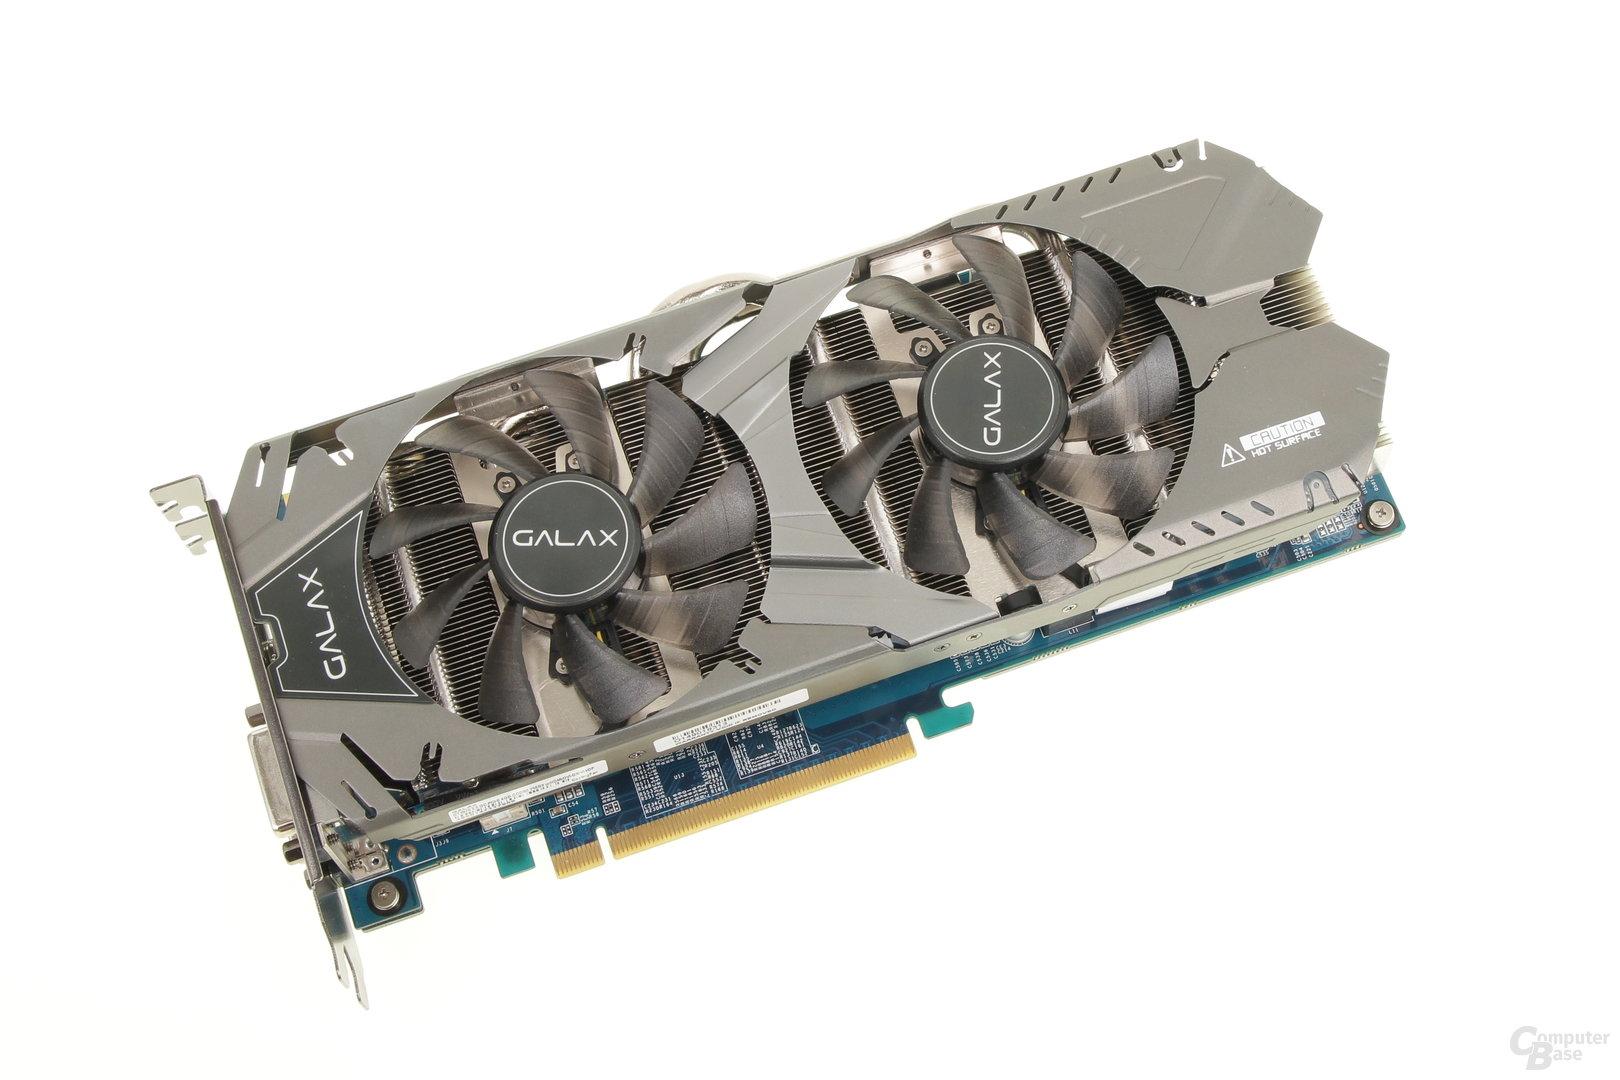 Galax GeForce GTX 970 OC EX